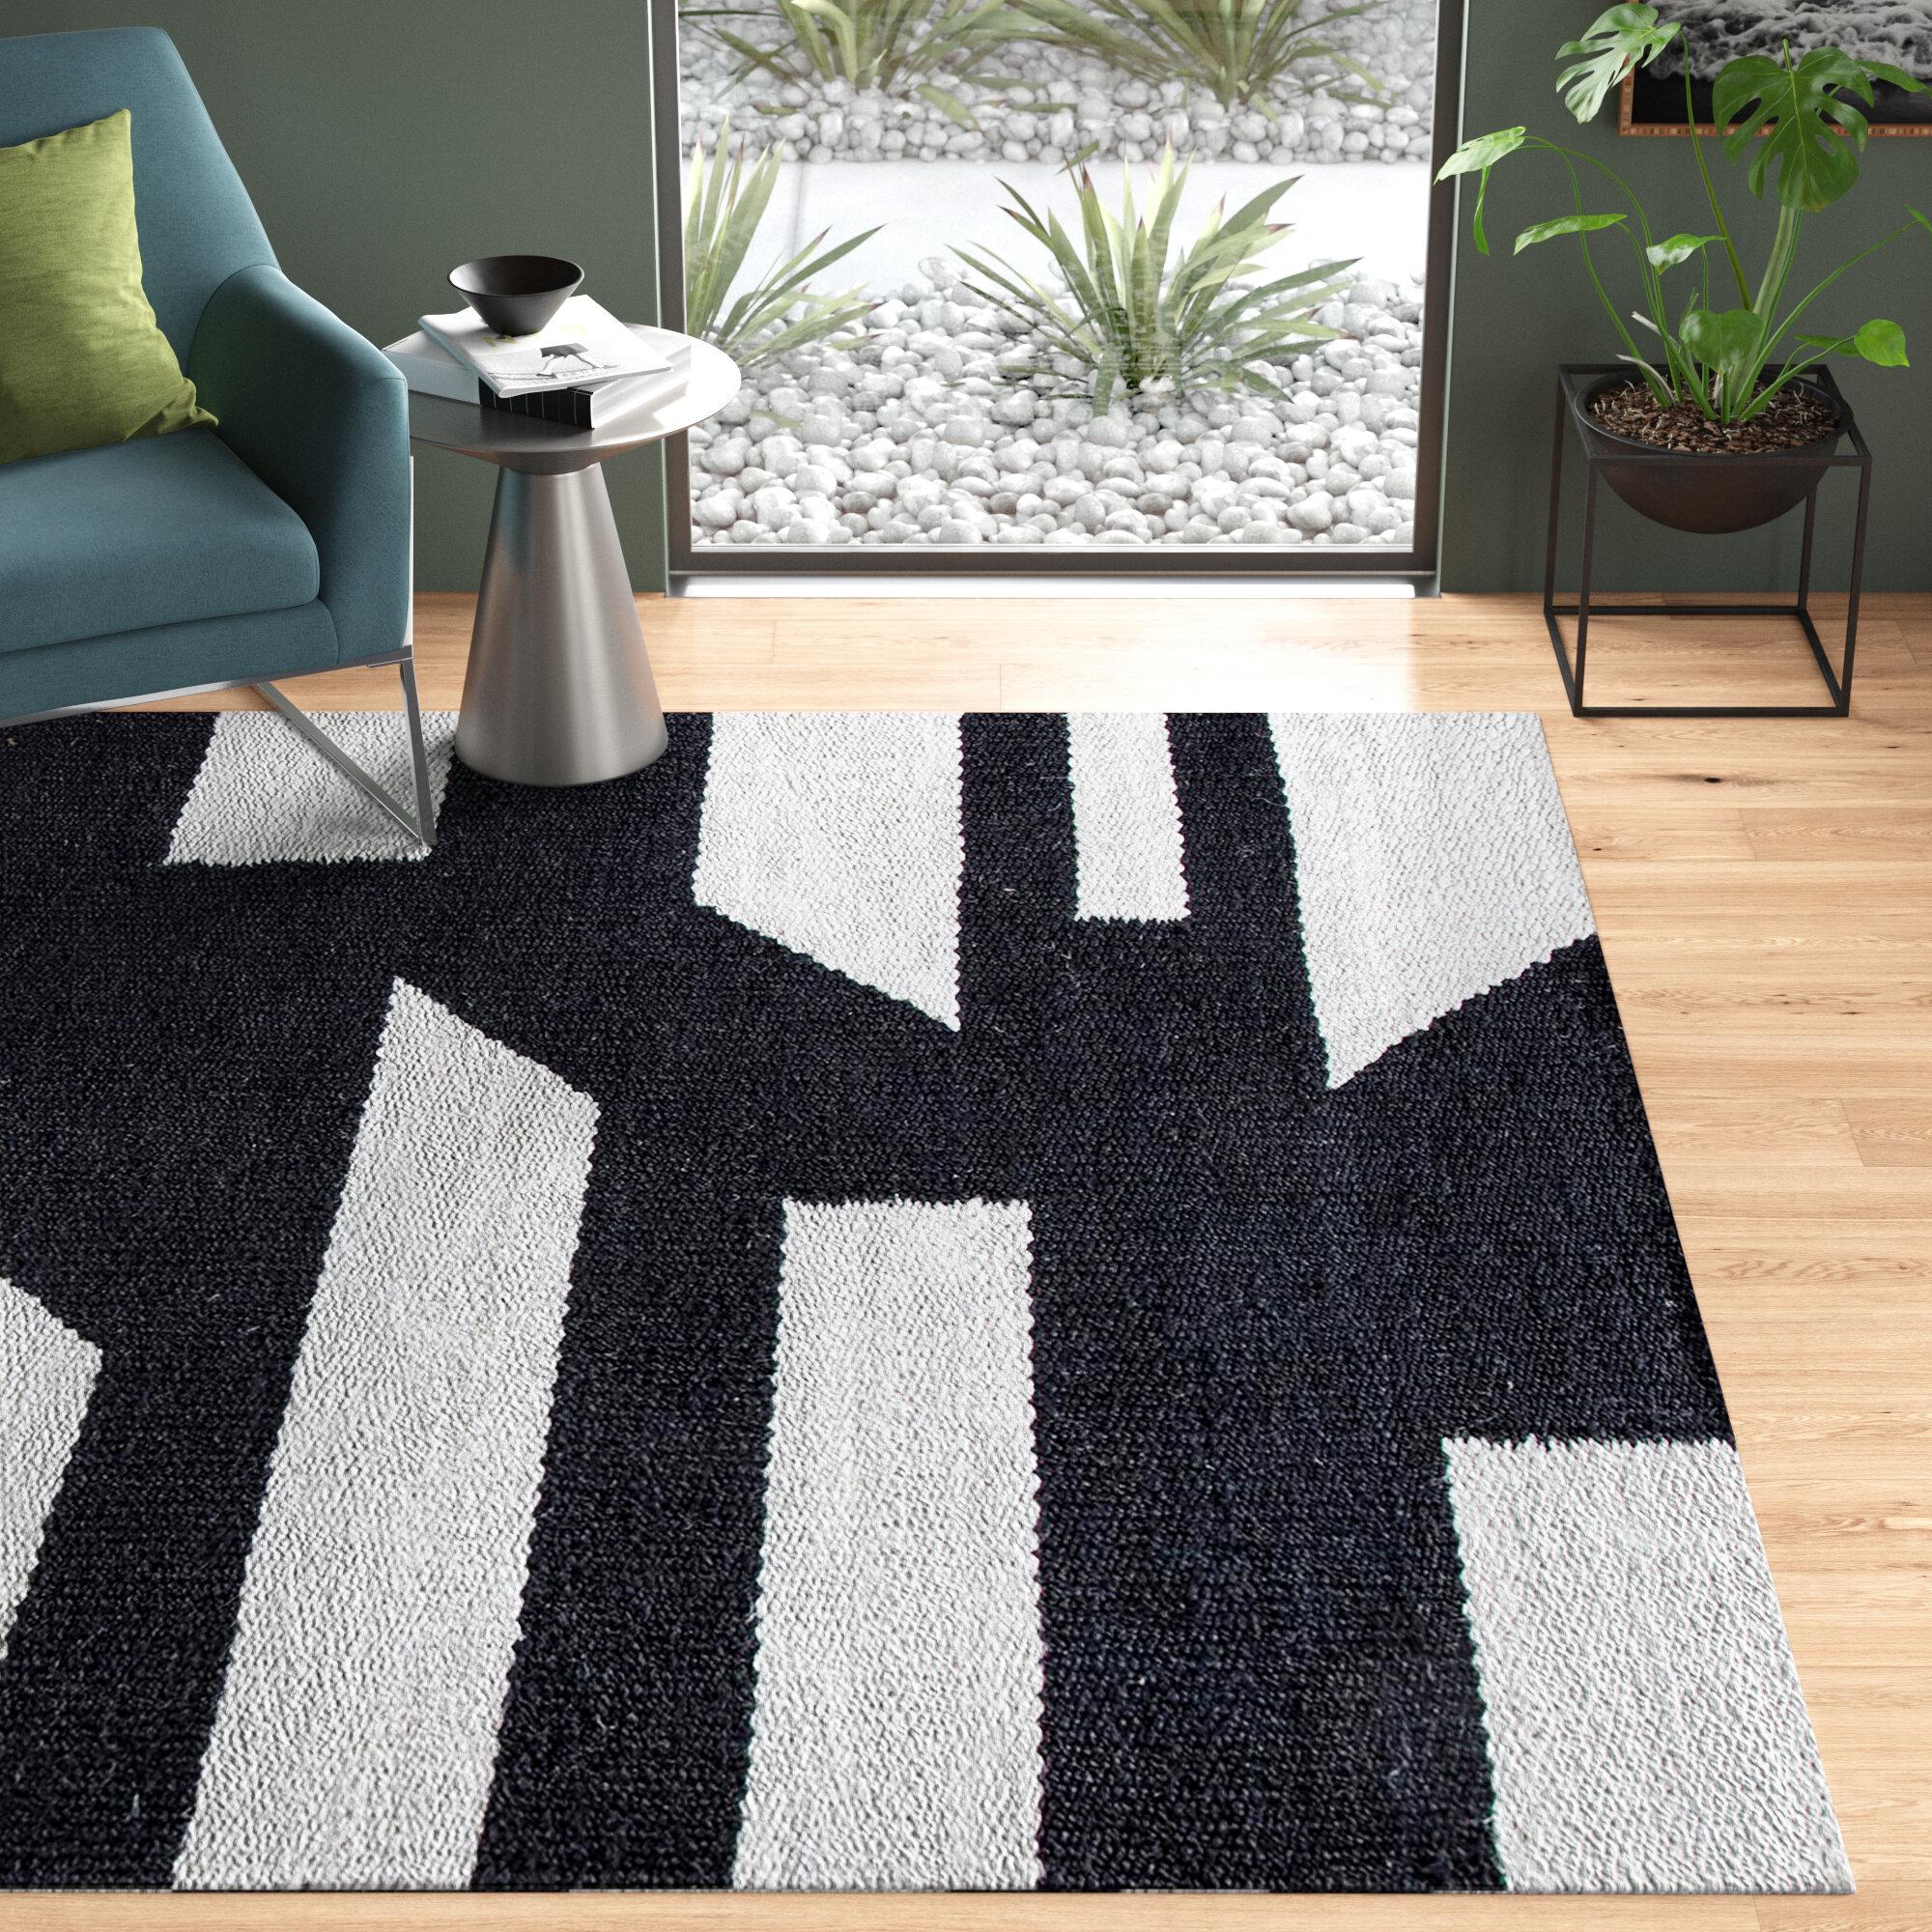 Allmodern Geometric Handmade Flatweave Jute Charcoal Gray Area Rug Reviews Wayfair